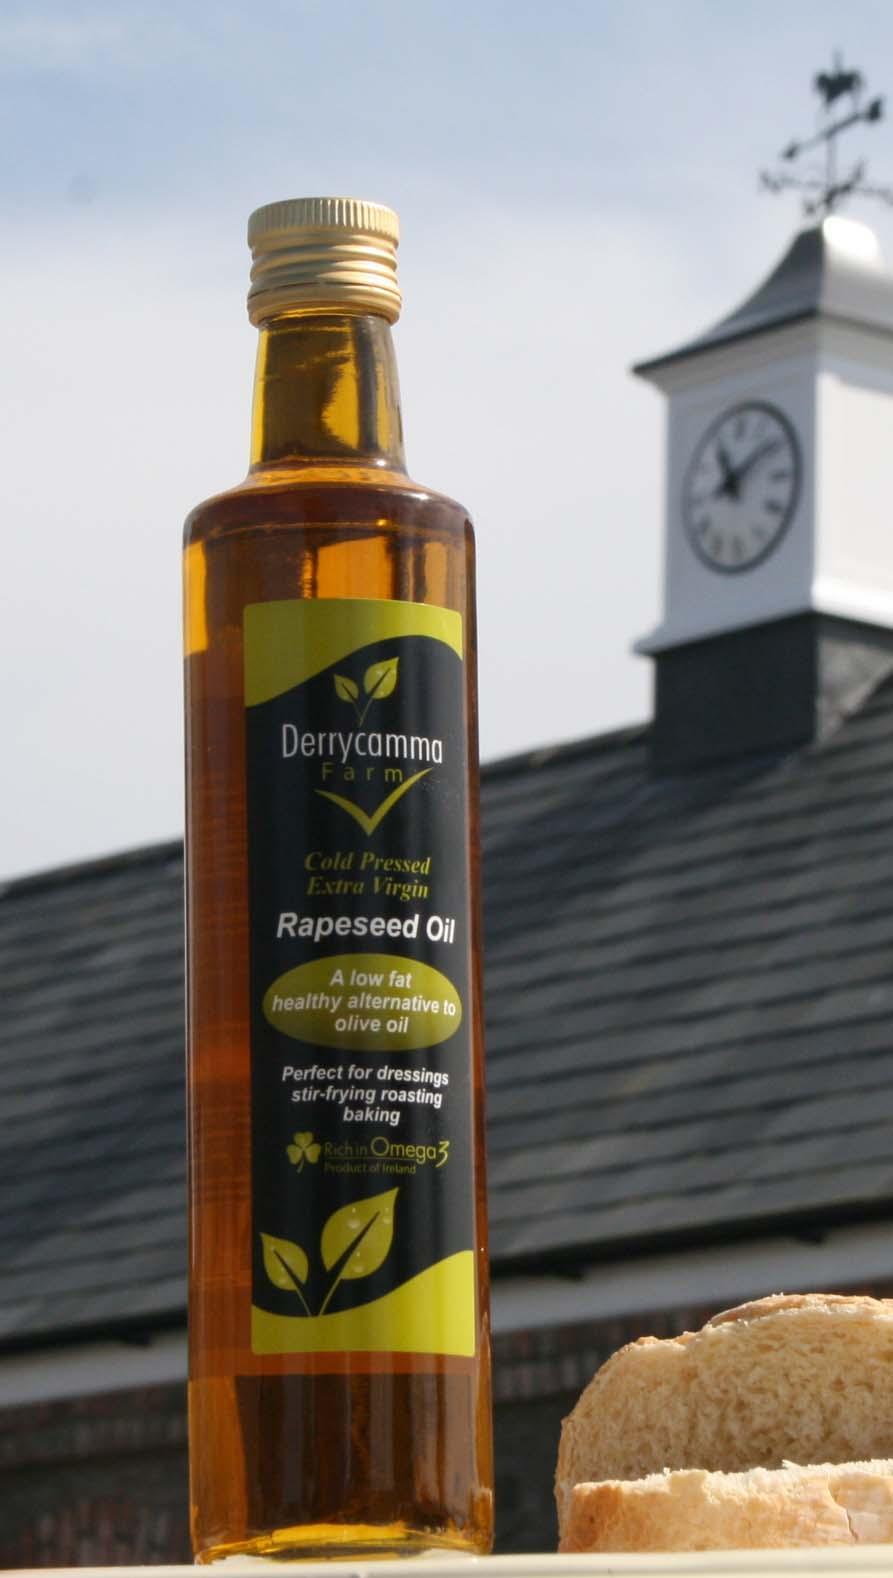 rapeseed oil irish rapeseed oil special irish foods. Black Bedroom Furniture Sets. Home Design Ideas